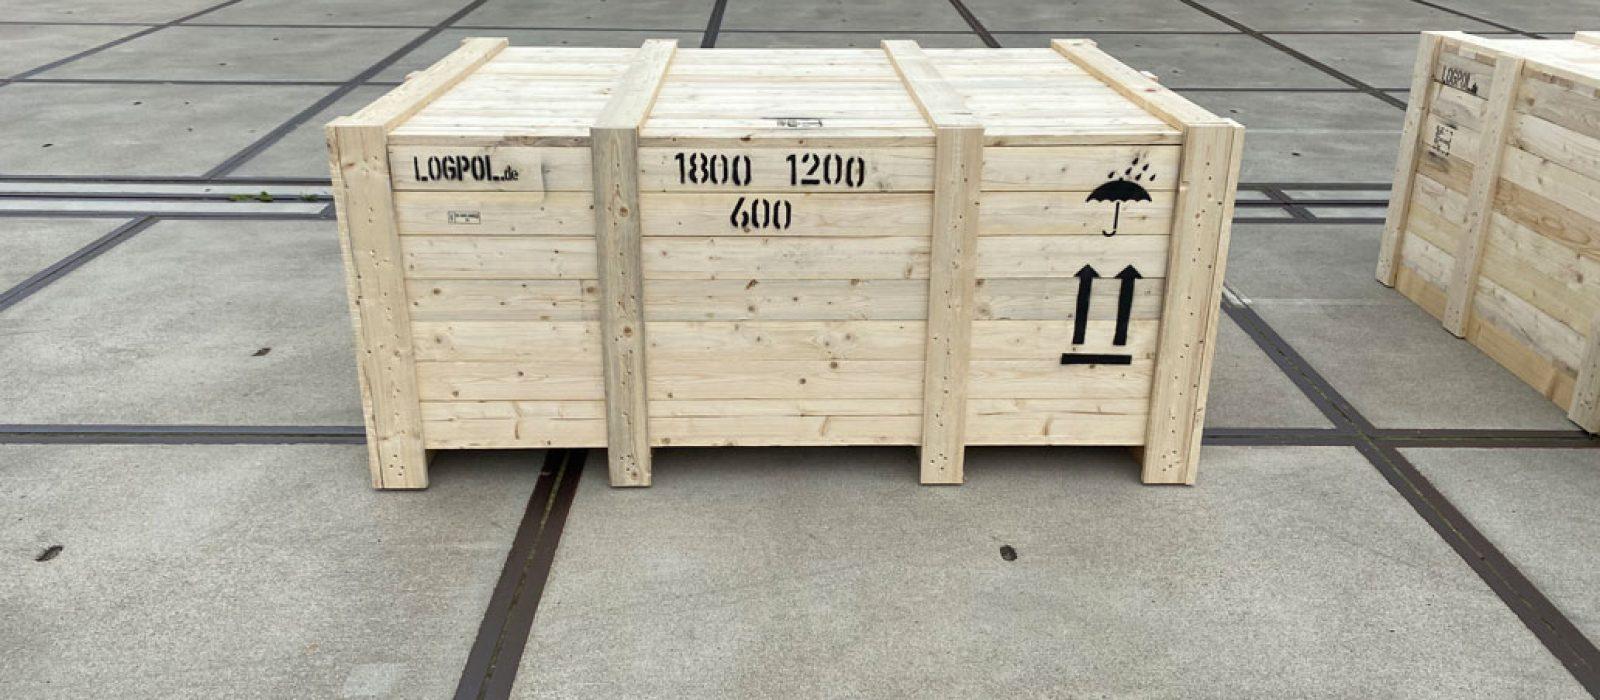 Holzkiste-1800×1200-mm-LOGPOL